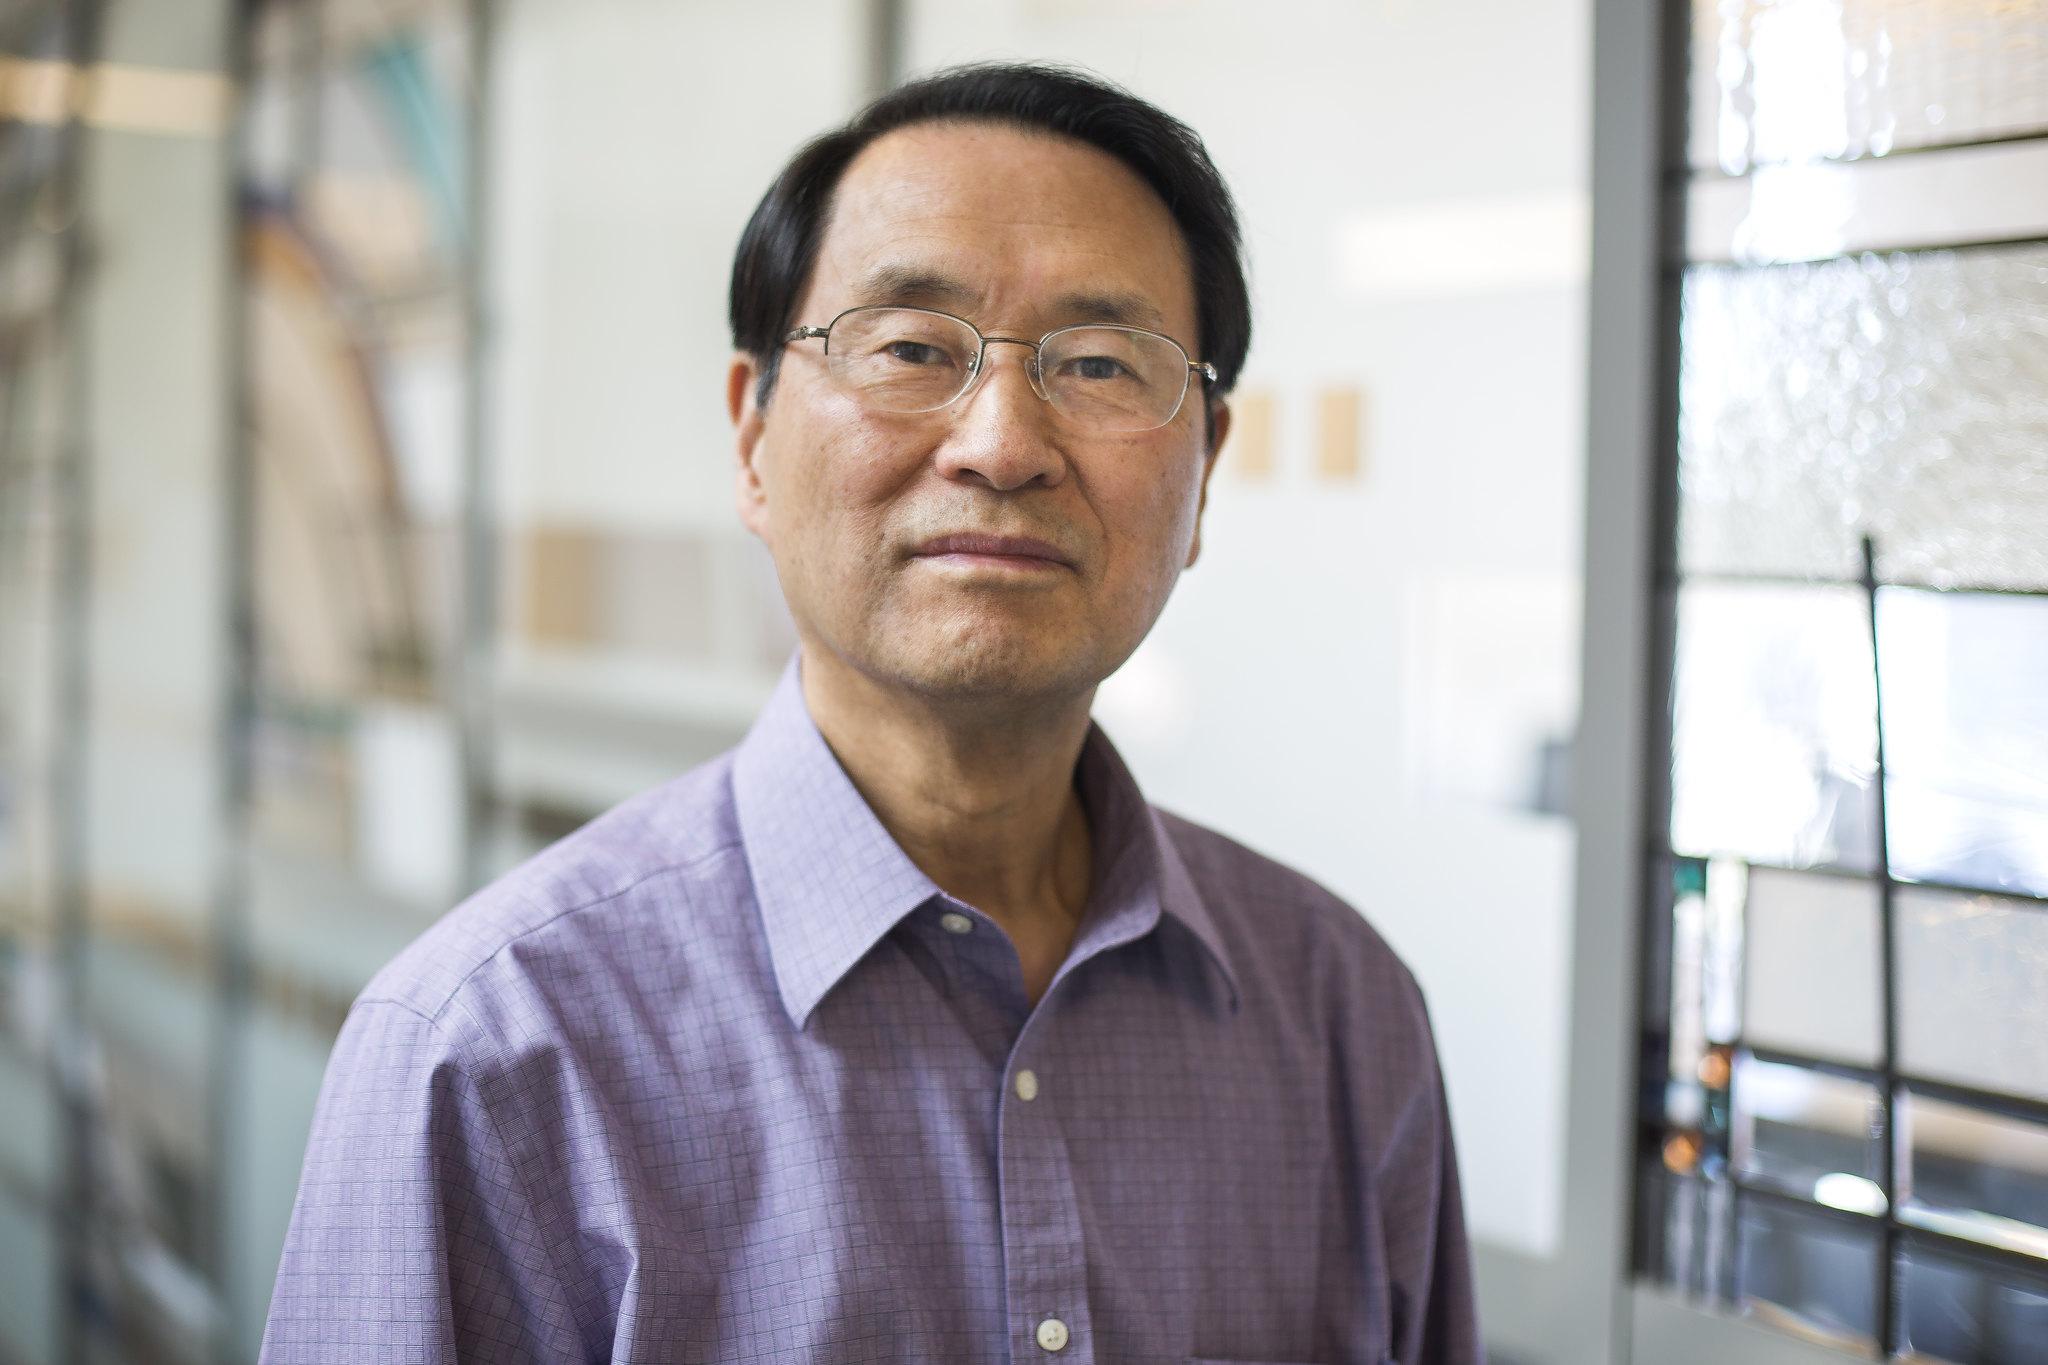 Professor John Lee